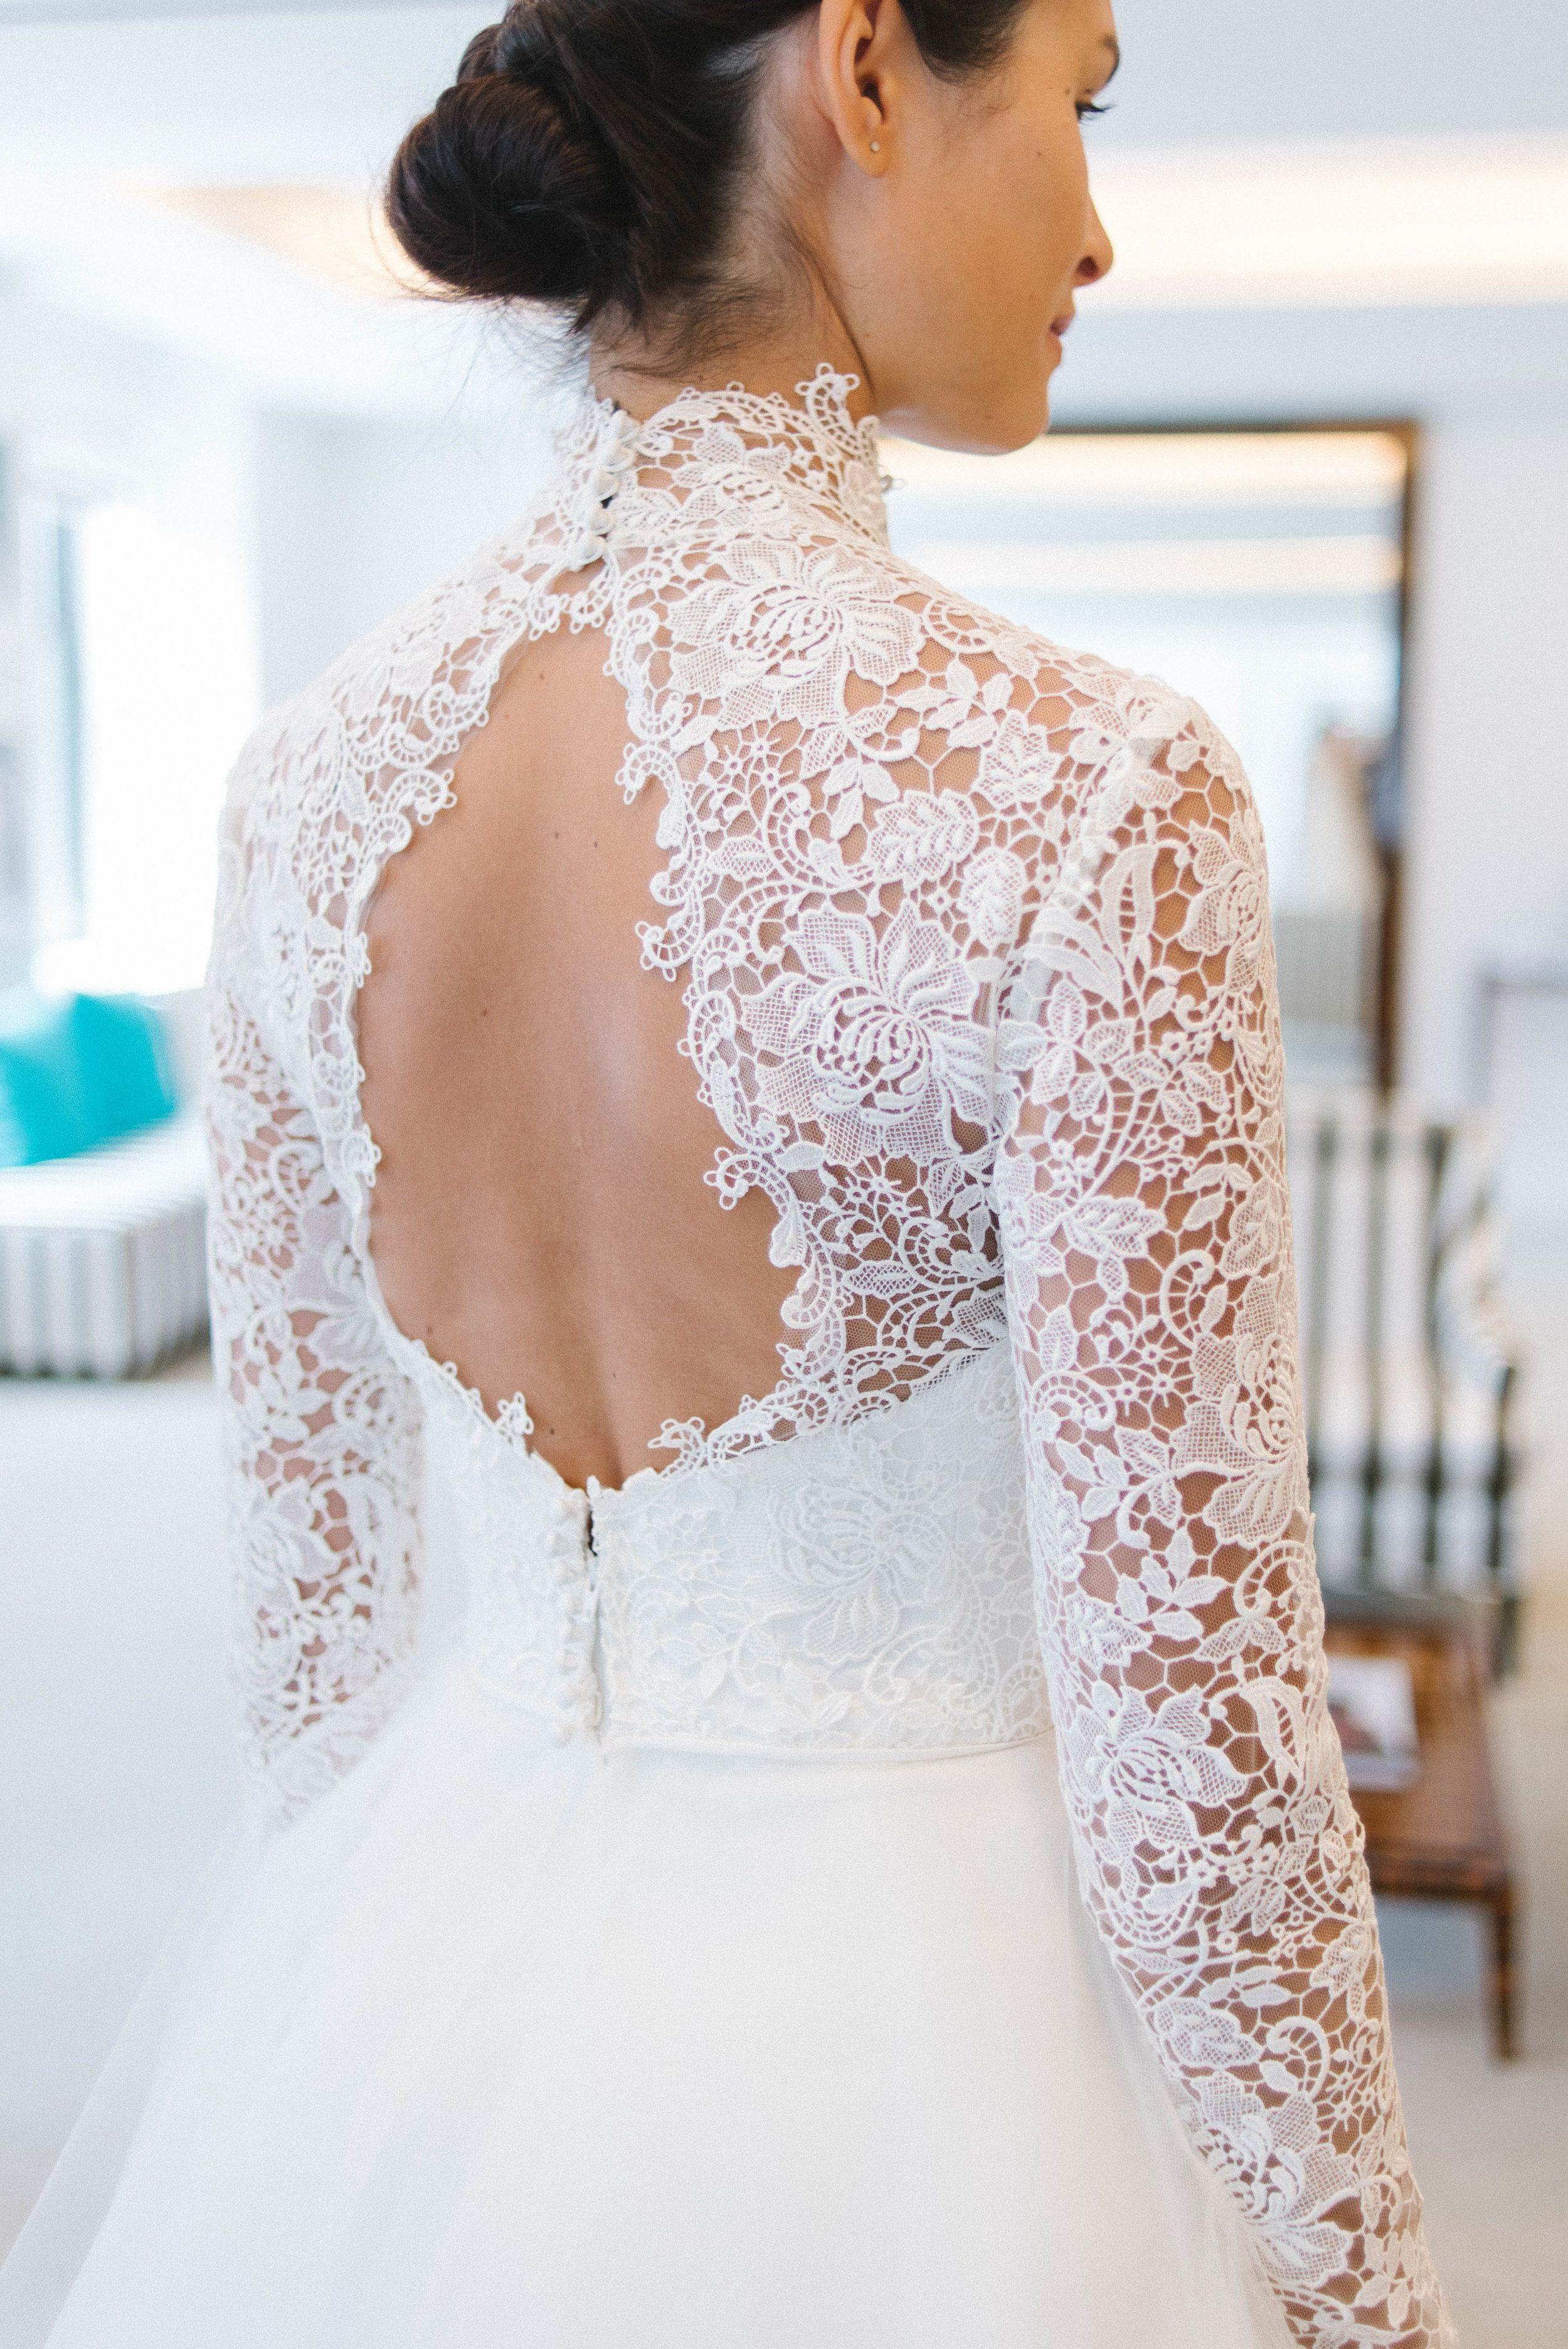 Carolina Herrera Spring 2020 Collection Preview #bridalshops